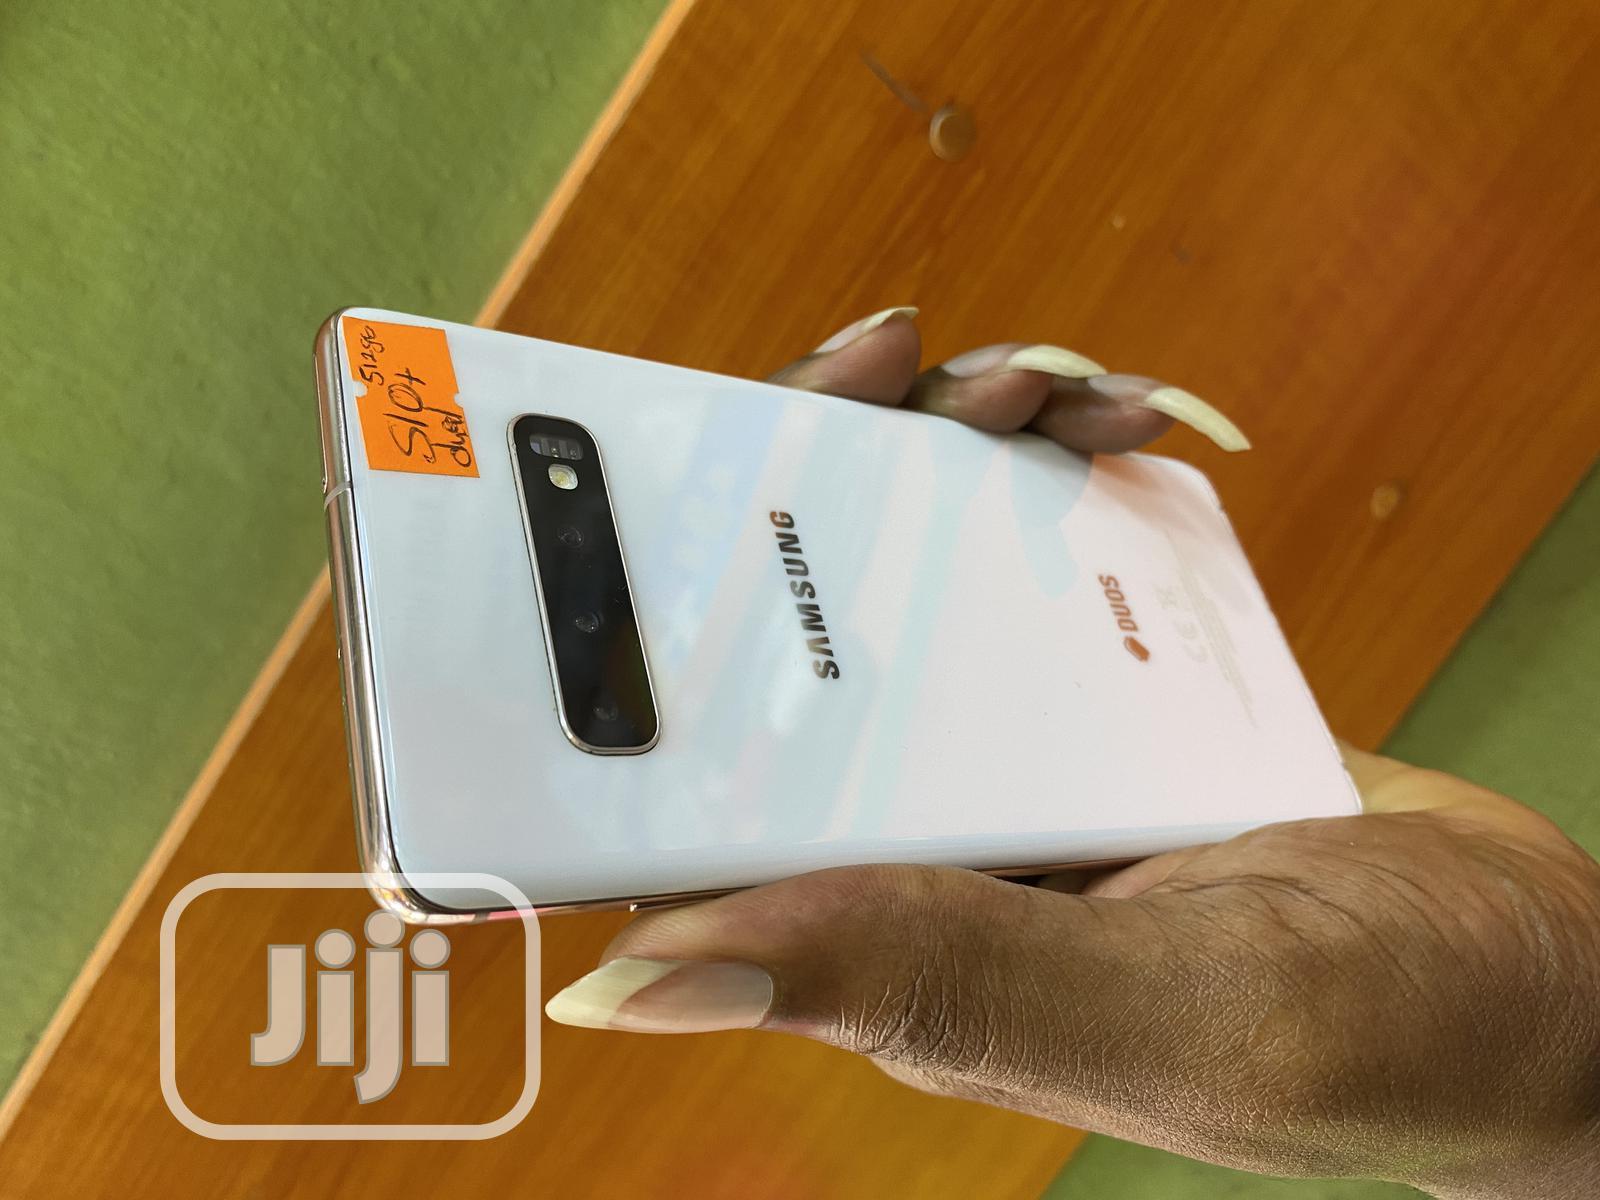 Samsung Galaxy S10 Plus 512 GB White